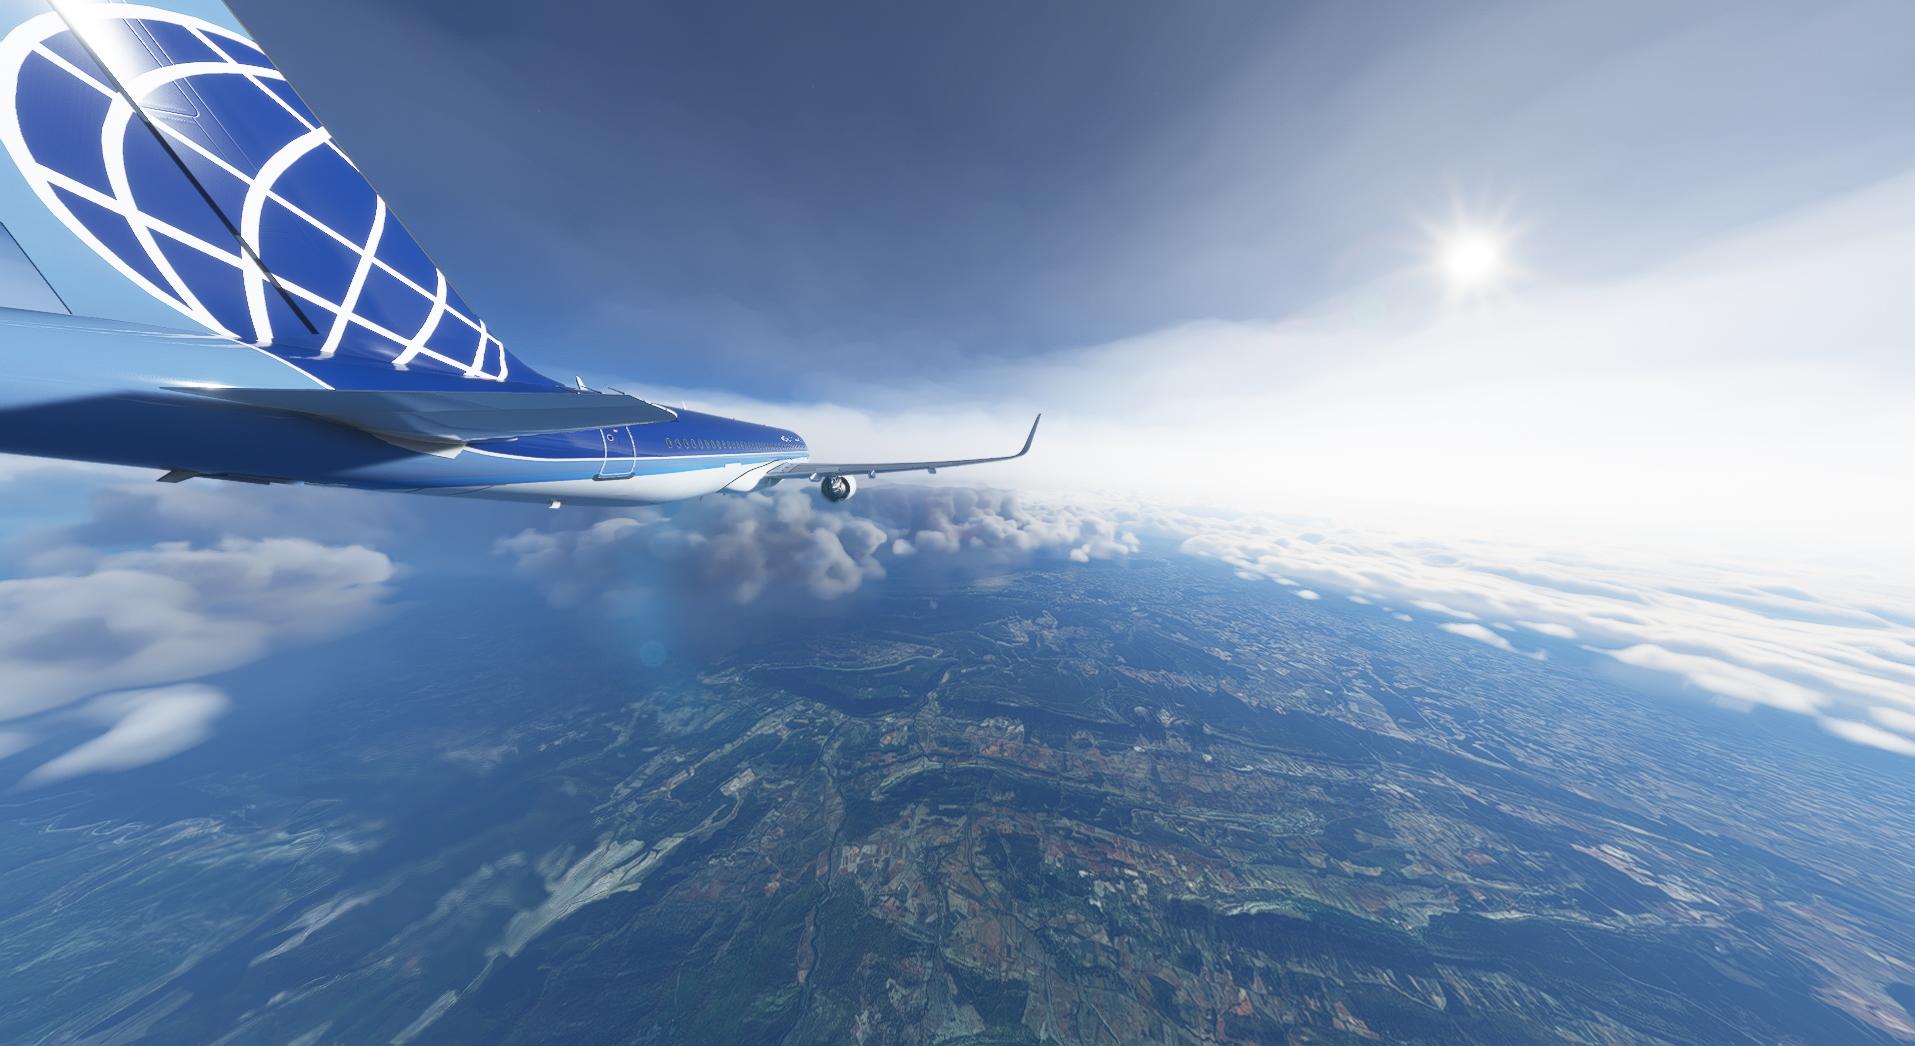 Microsoft Flight Simulator Airbus A320 Overland